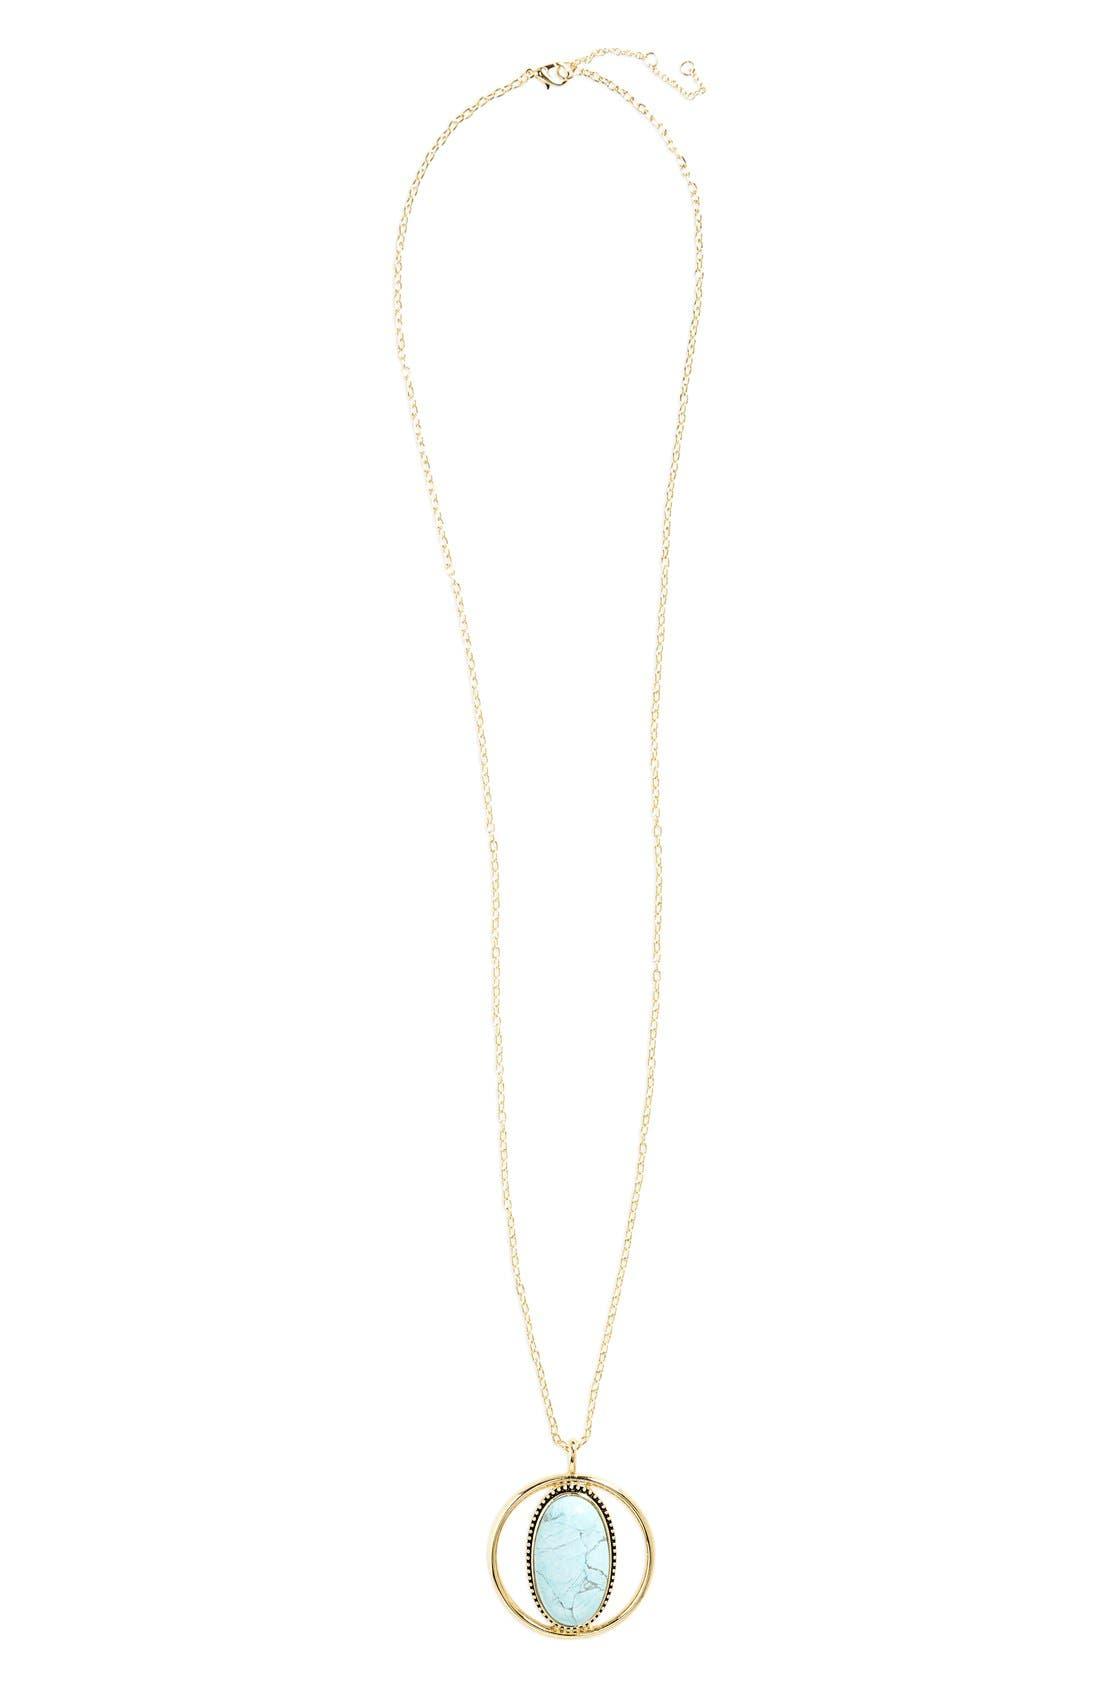 Main Image - BP. Oval Stone Pendant Necklace